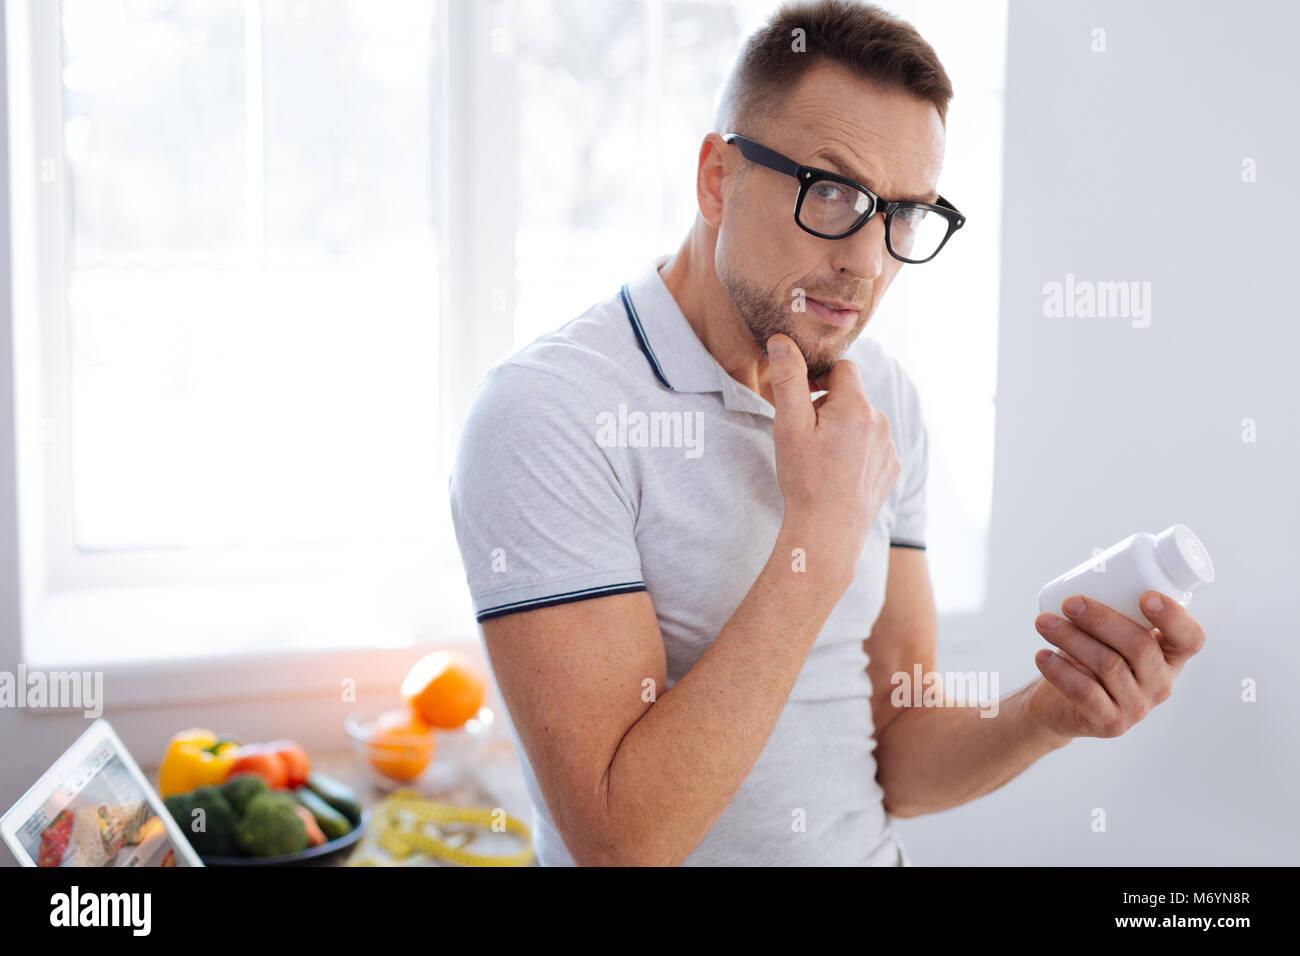 Pensive thoughtful man studying biohacking drug - Stock Image